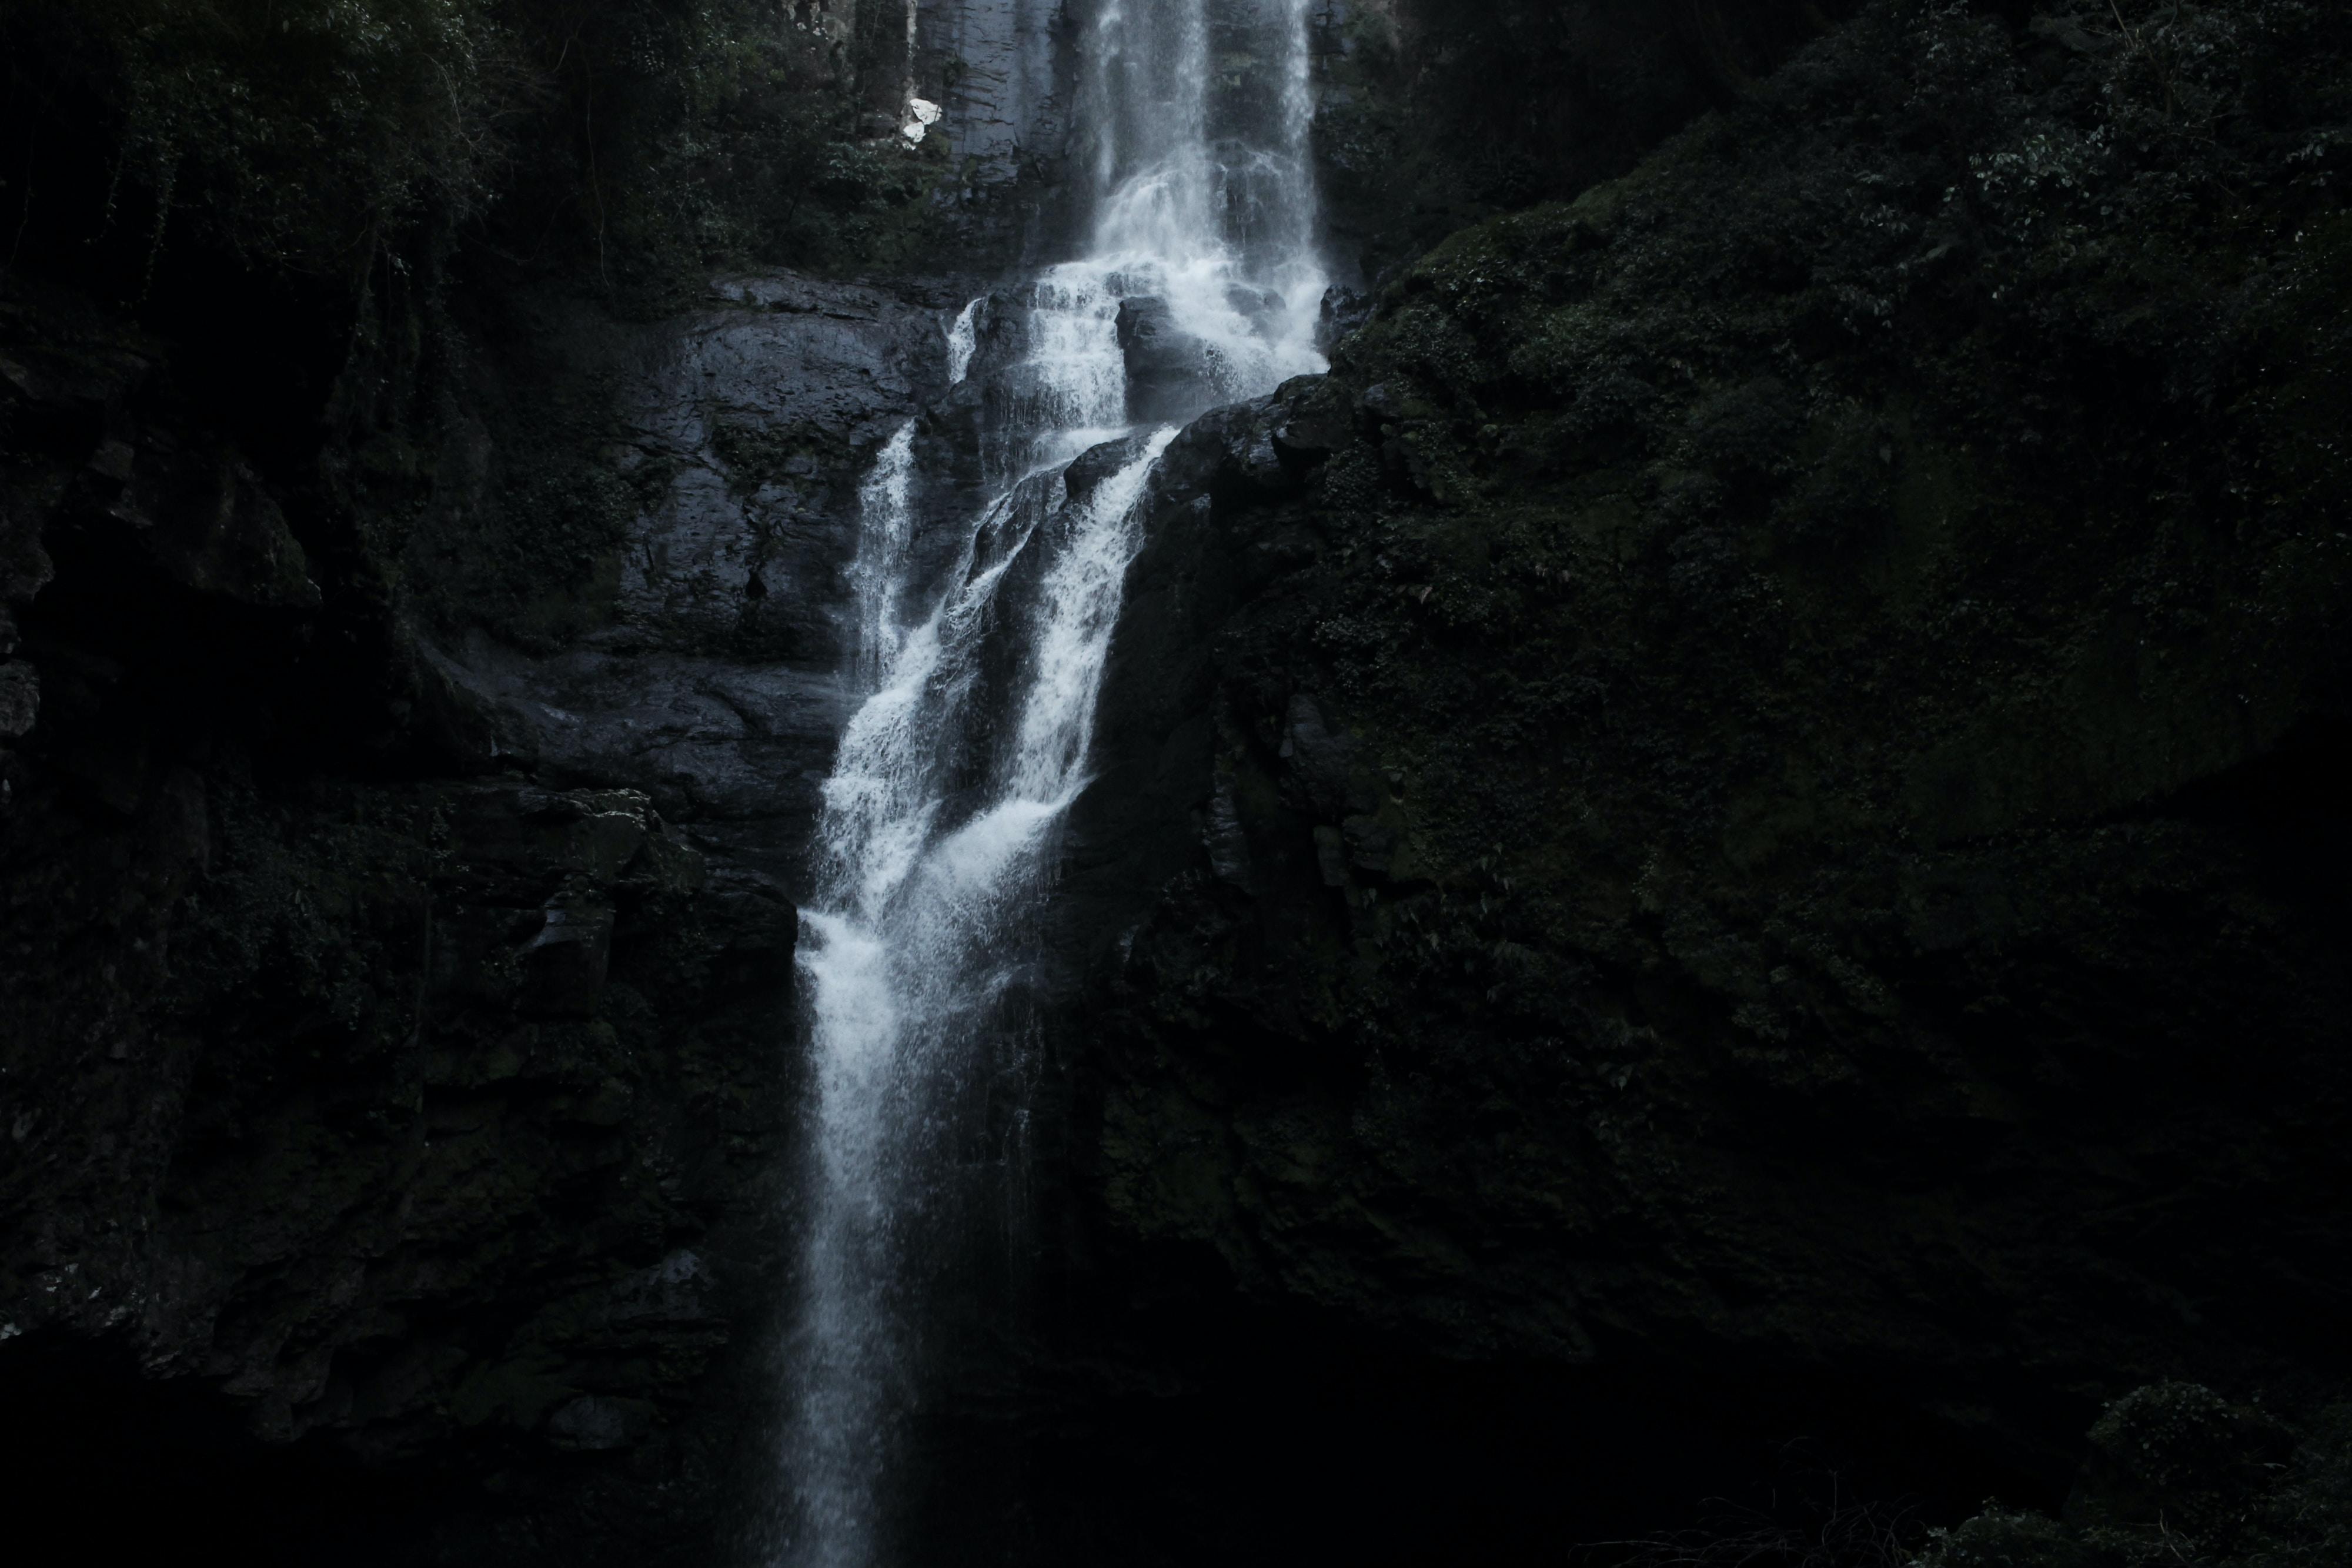 Large waterfall tumbling down a rock cliff seen through a dark filter